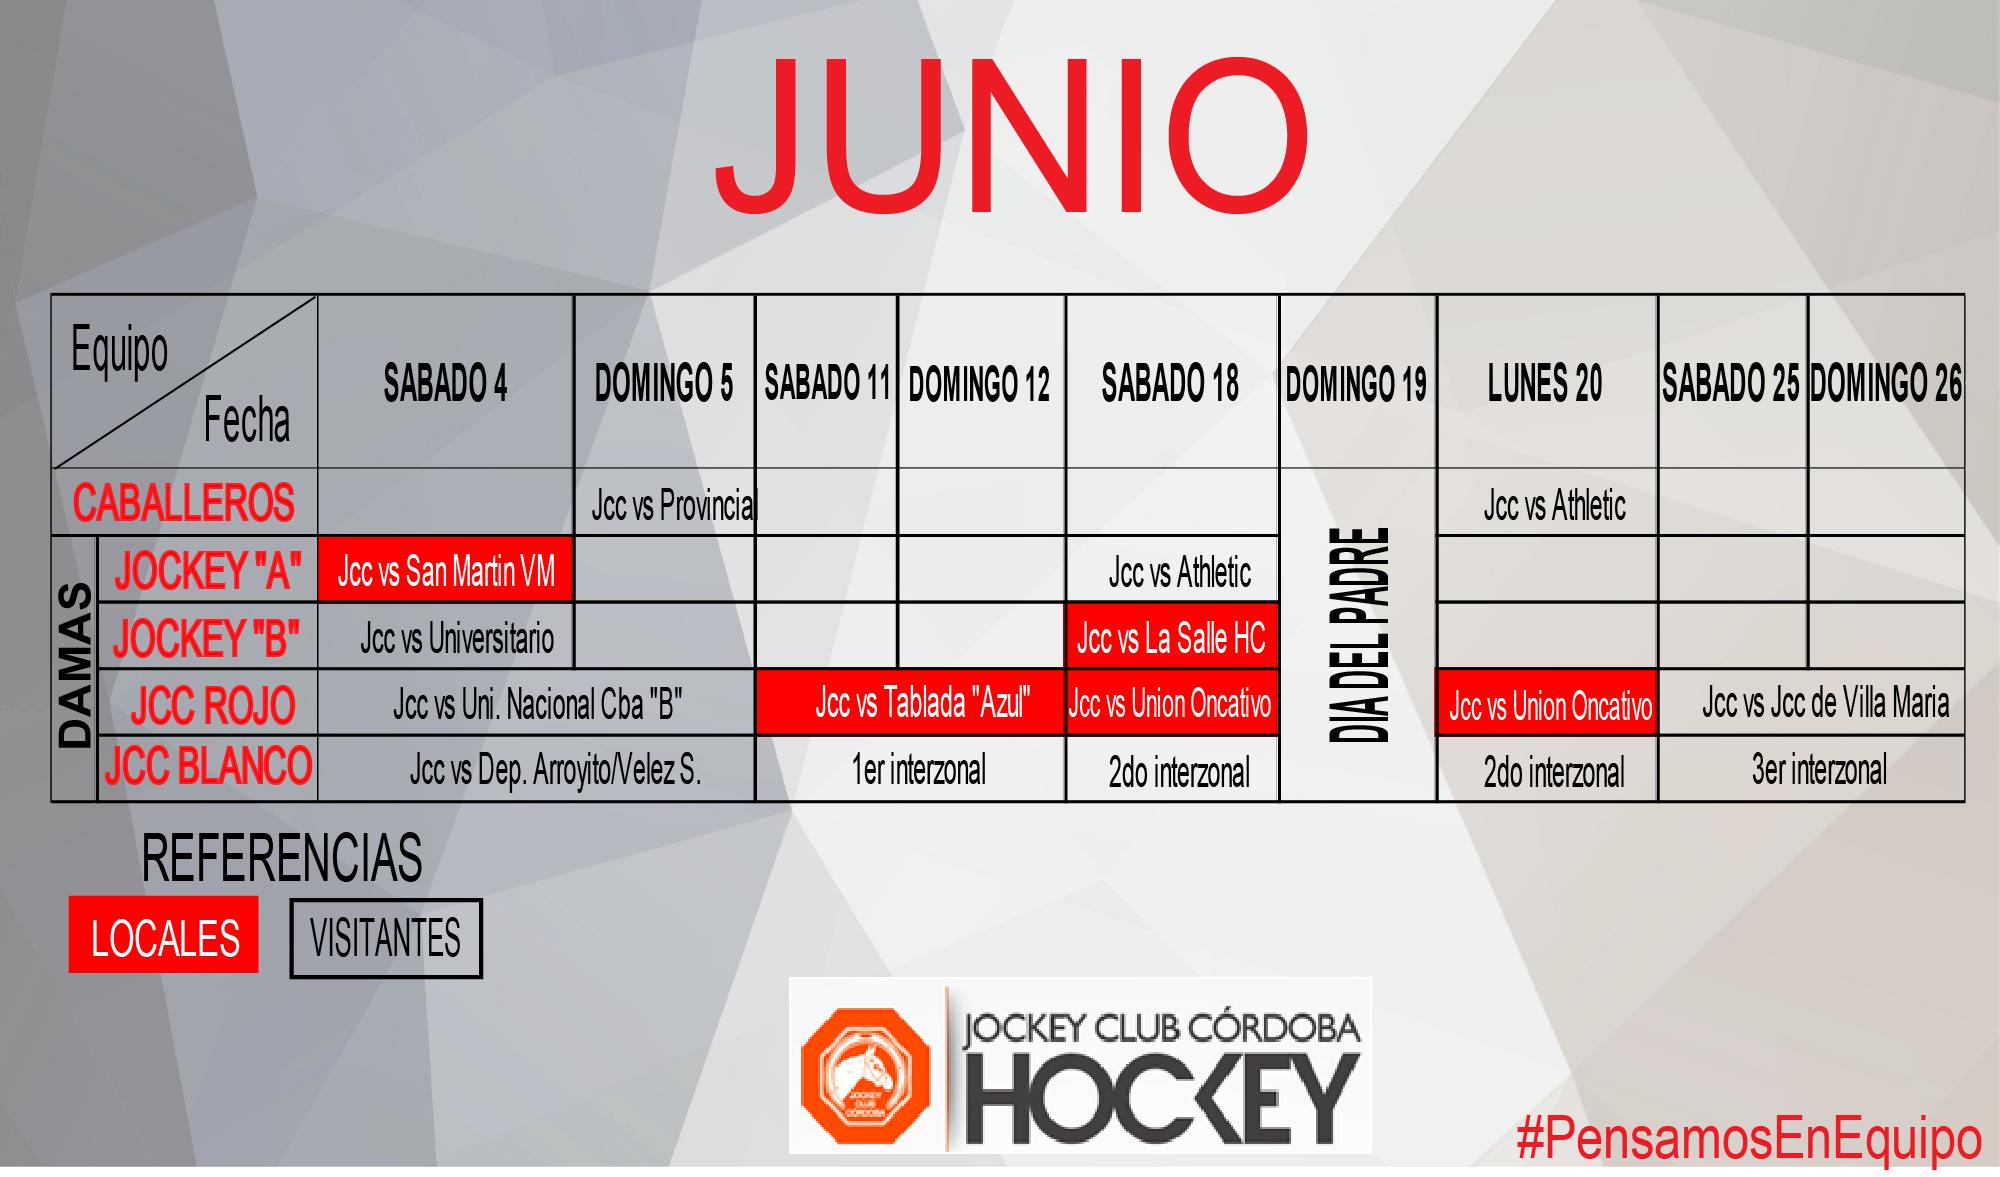 Partidos junio 2016 - JCC Hockey